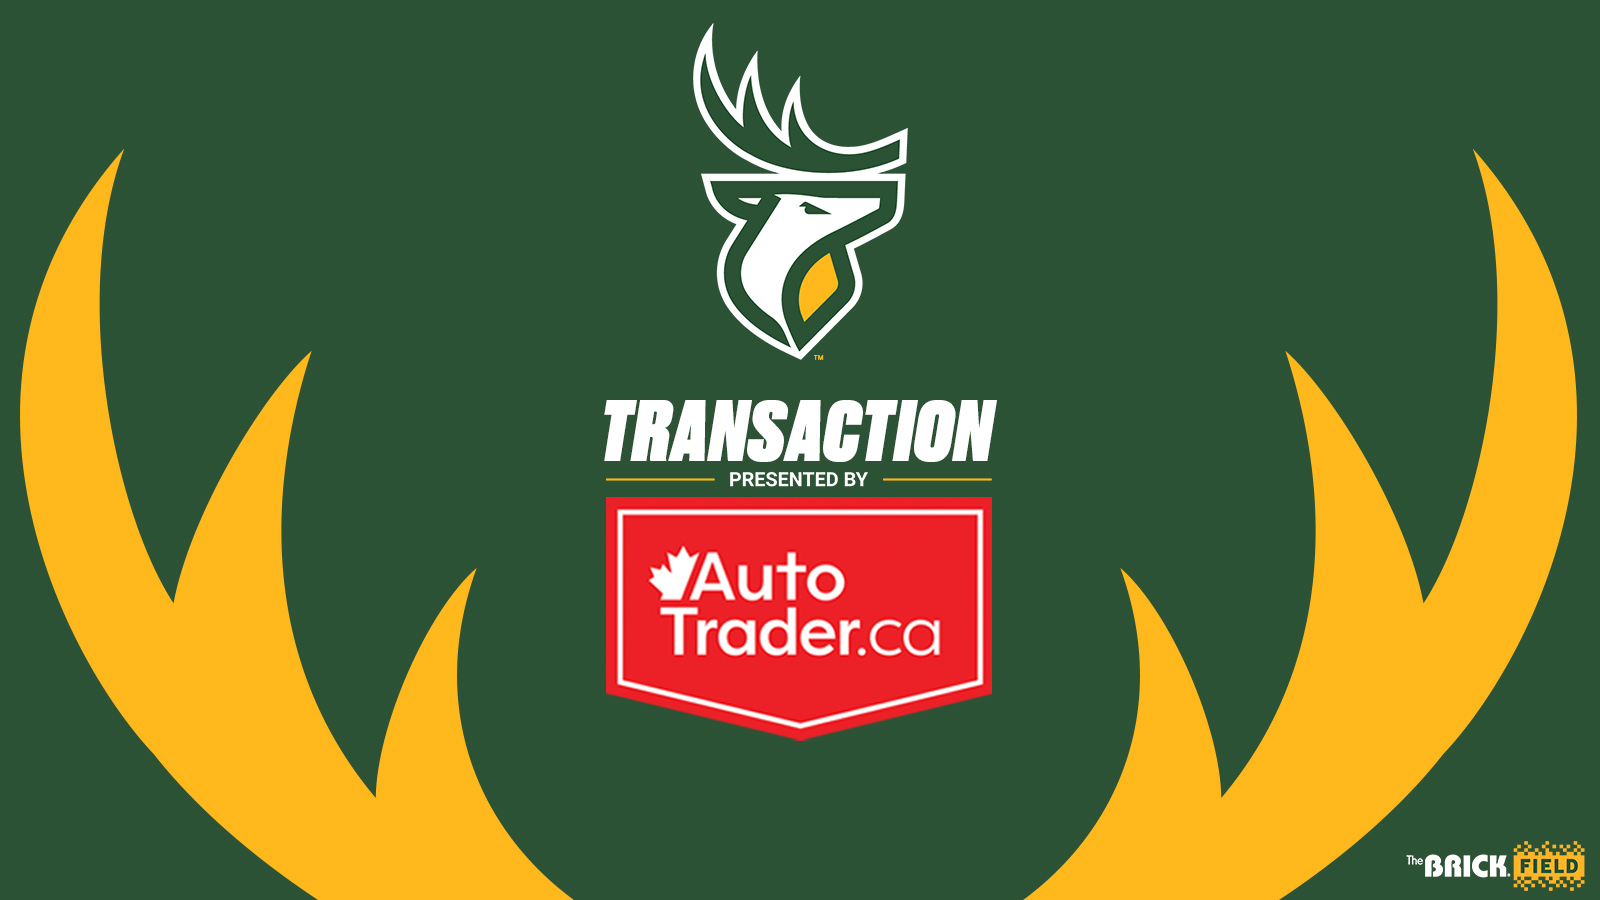 Autotrader Transactions